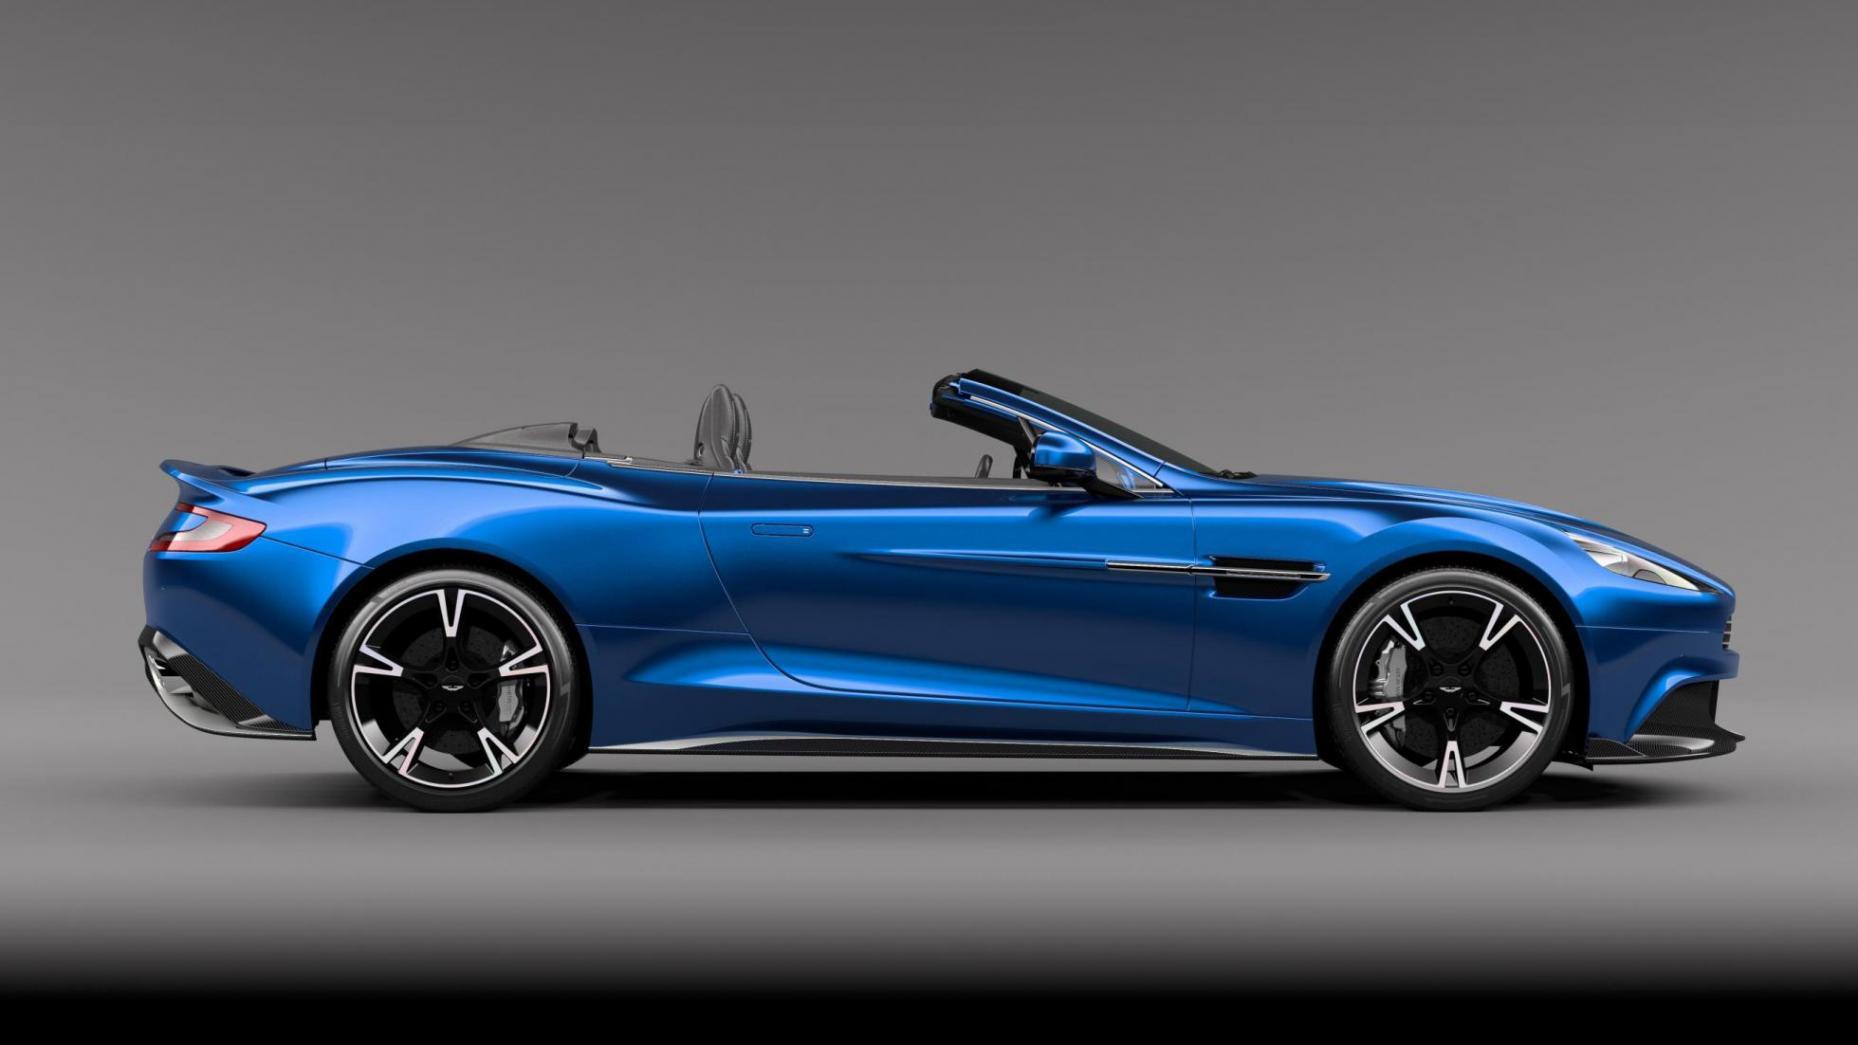 Mejores descapotables: Aston Martin Vanquish S Volante (I)